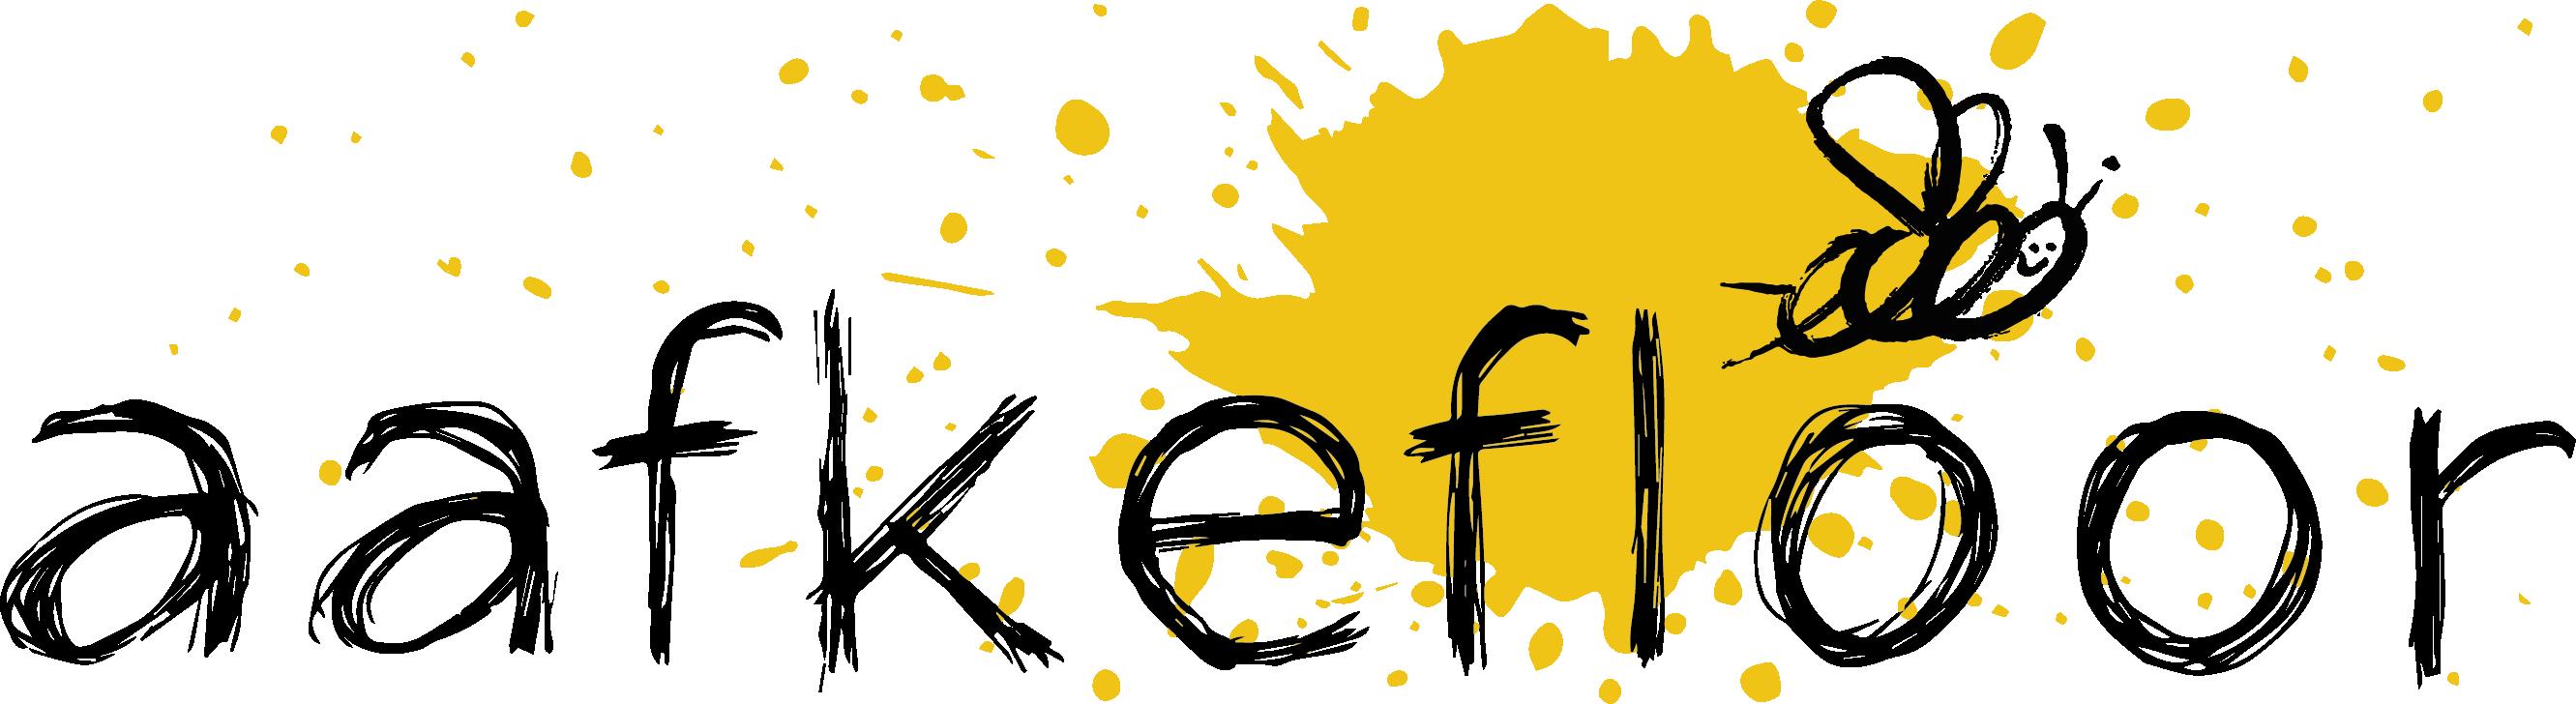 aafkefloor